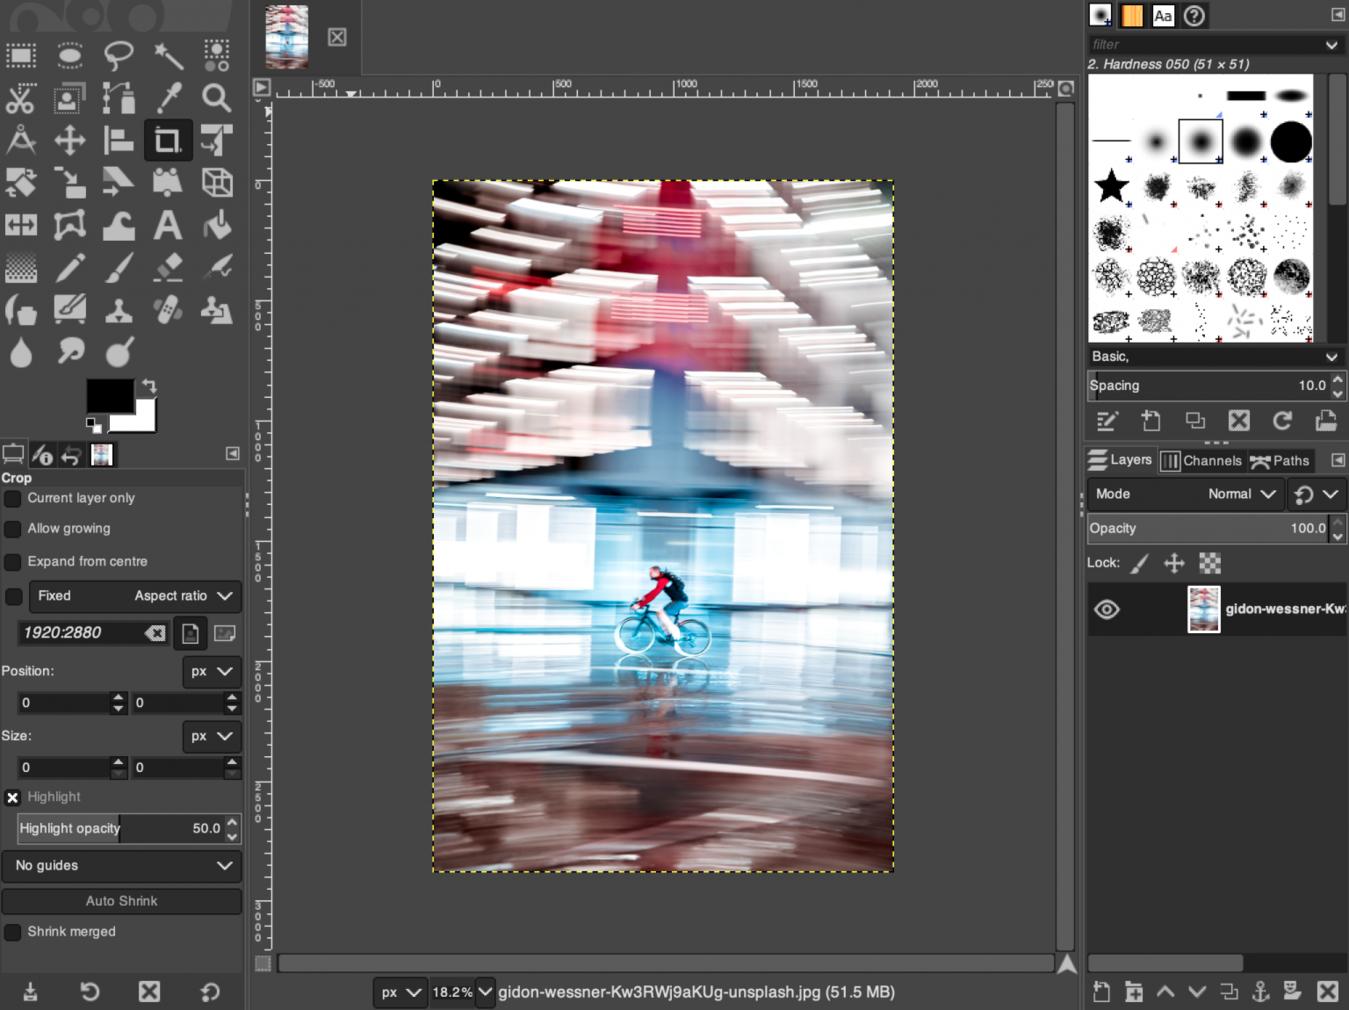 phần mềm chỉnh ảnh online GIMP